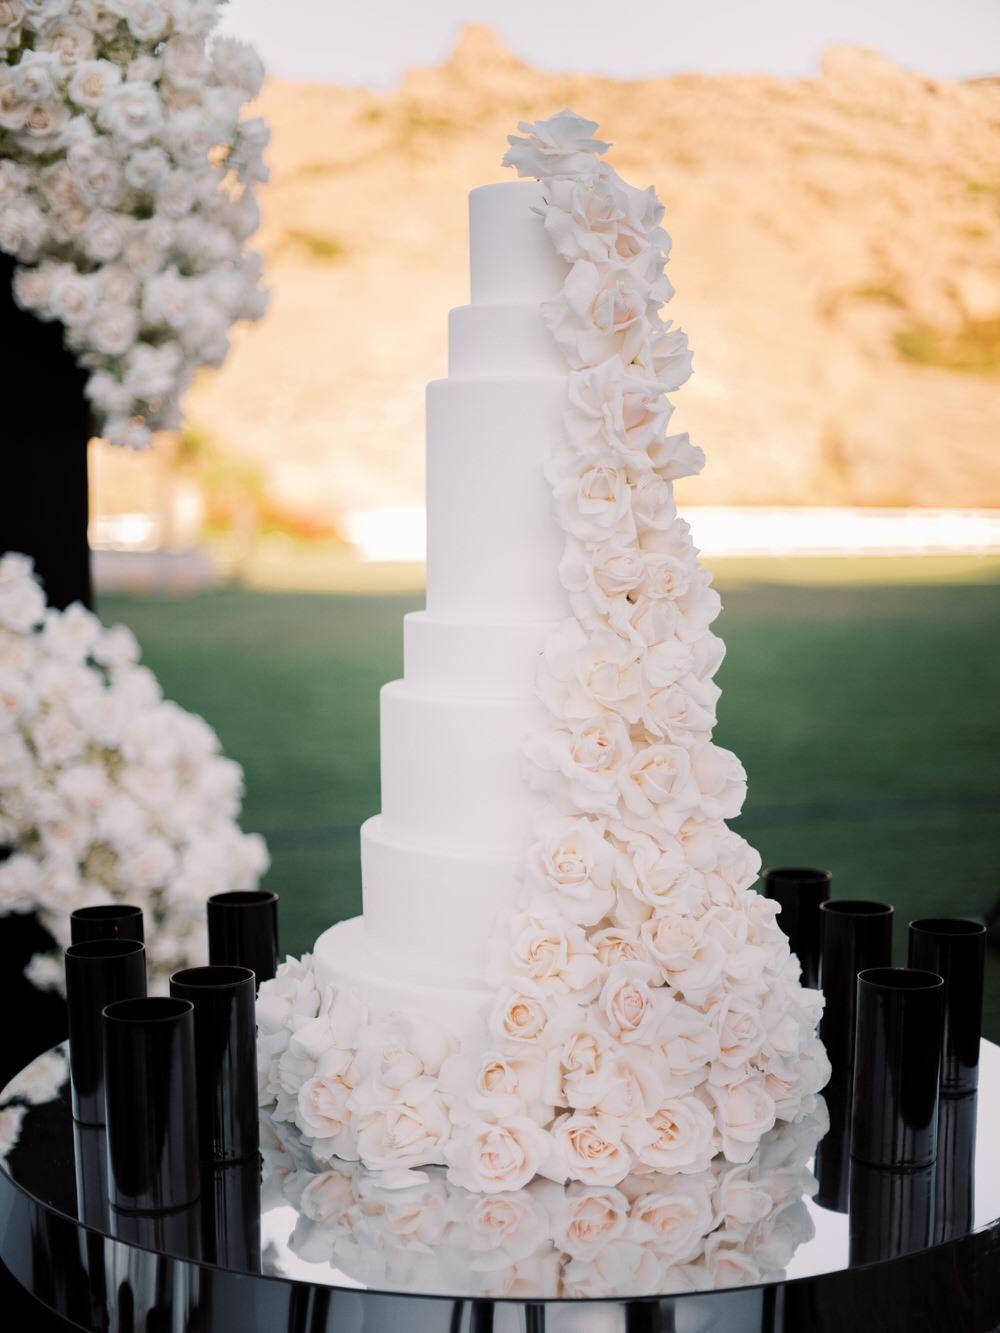 Glamorous Monochromatic Wedding at Hummingbird's Nest Ranch ⋆ Ruffled